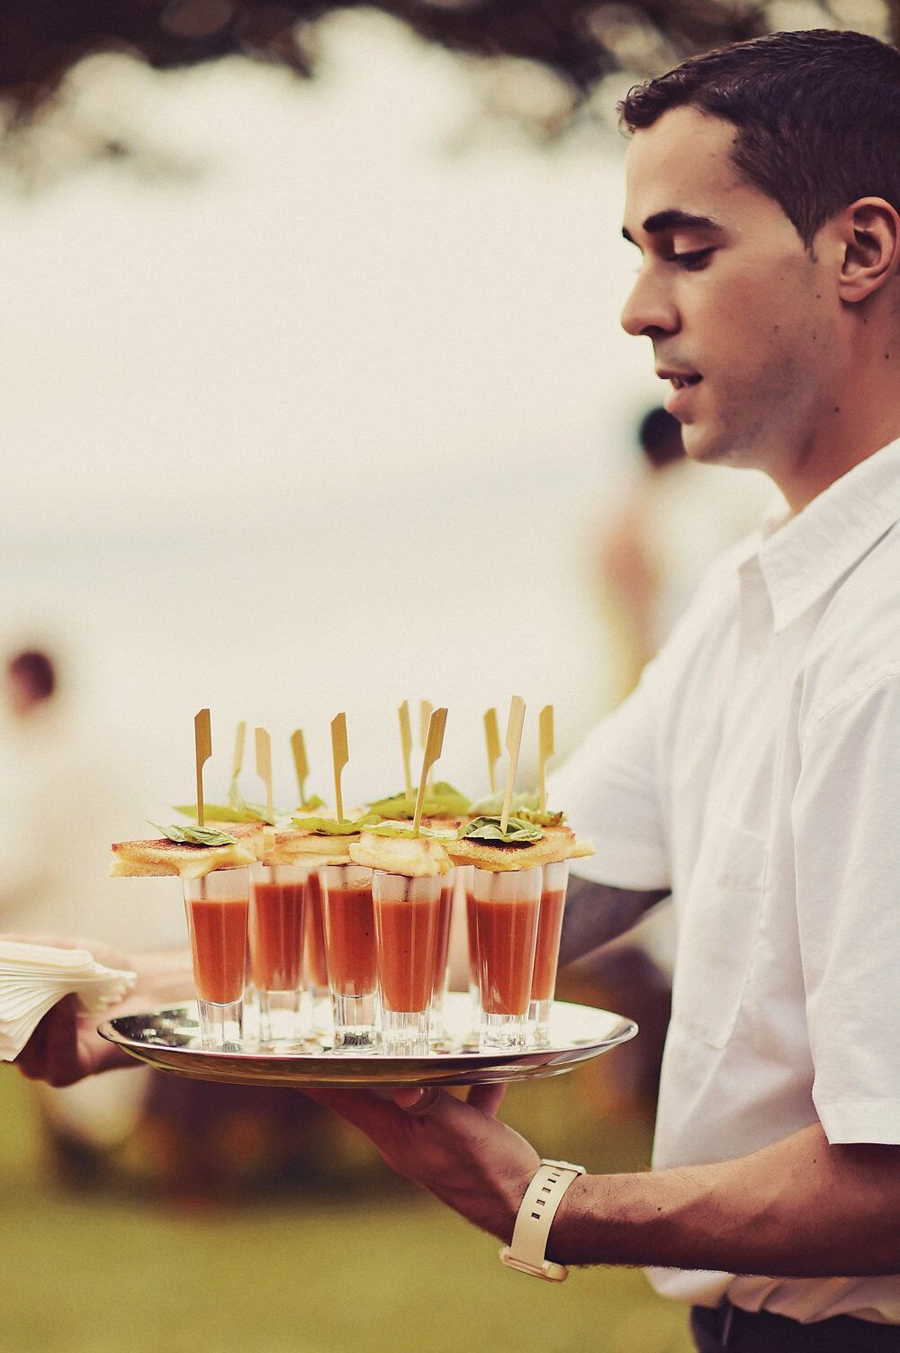 Wedding, Reception, Wedding Reception, Appetizer, Appetizers